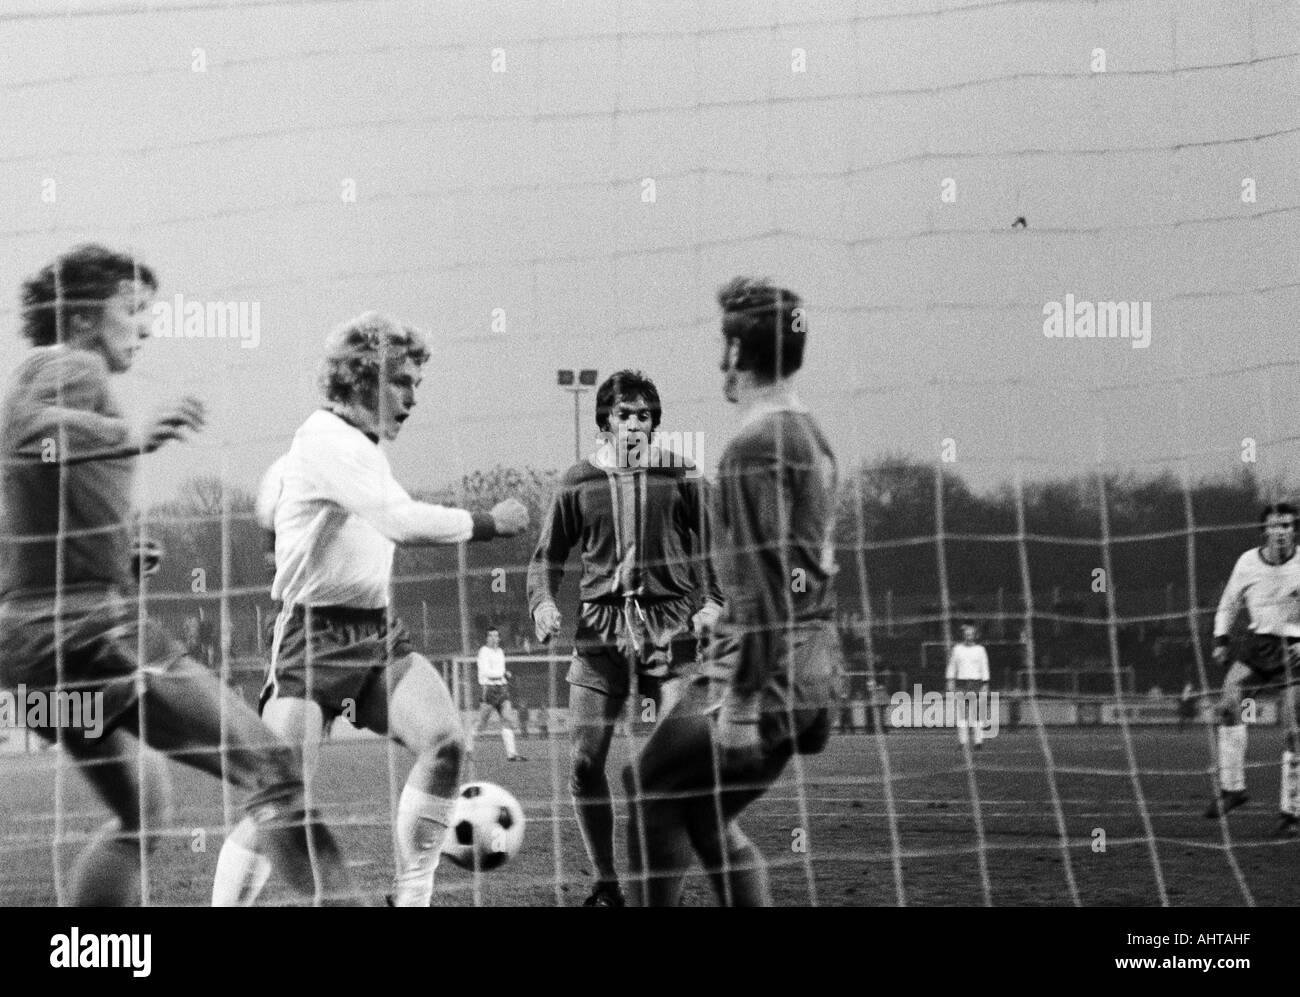 football, Bundesliga, 1971/1972, Rot-Weiss Oberhausen versus Eintracht Brunswick 1:1, Niederrhein Stadium in Oberhausen, scene of the match, f.l.t.r. Franz Merkhoffer (Braunschweig), Franz Emans (RWO), Bernd Gersdorff (Braunschweig), a Braunschweig player - Stock Image